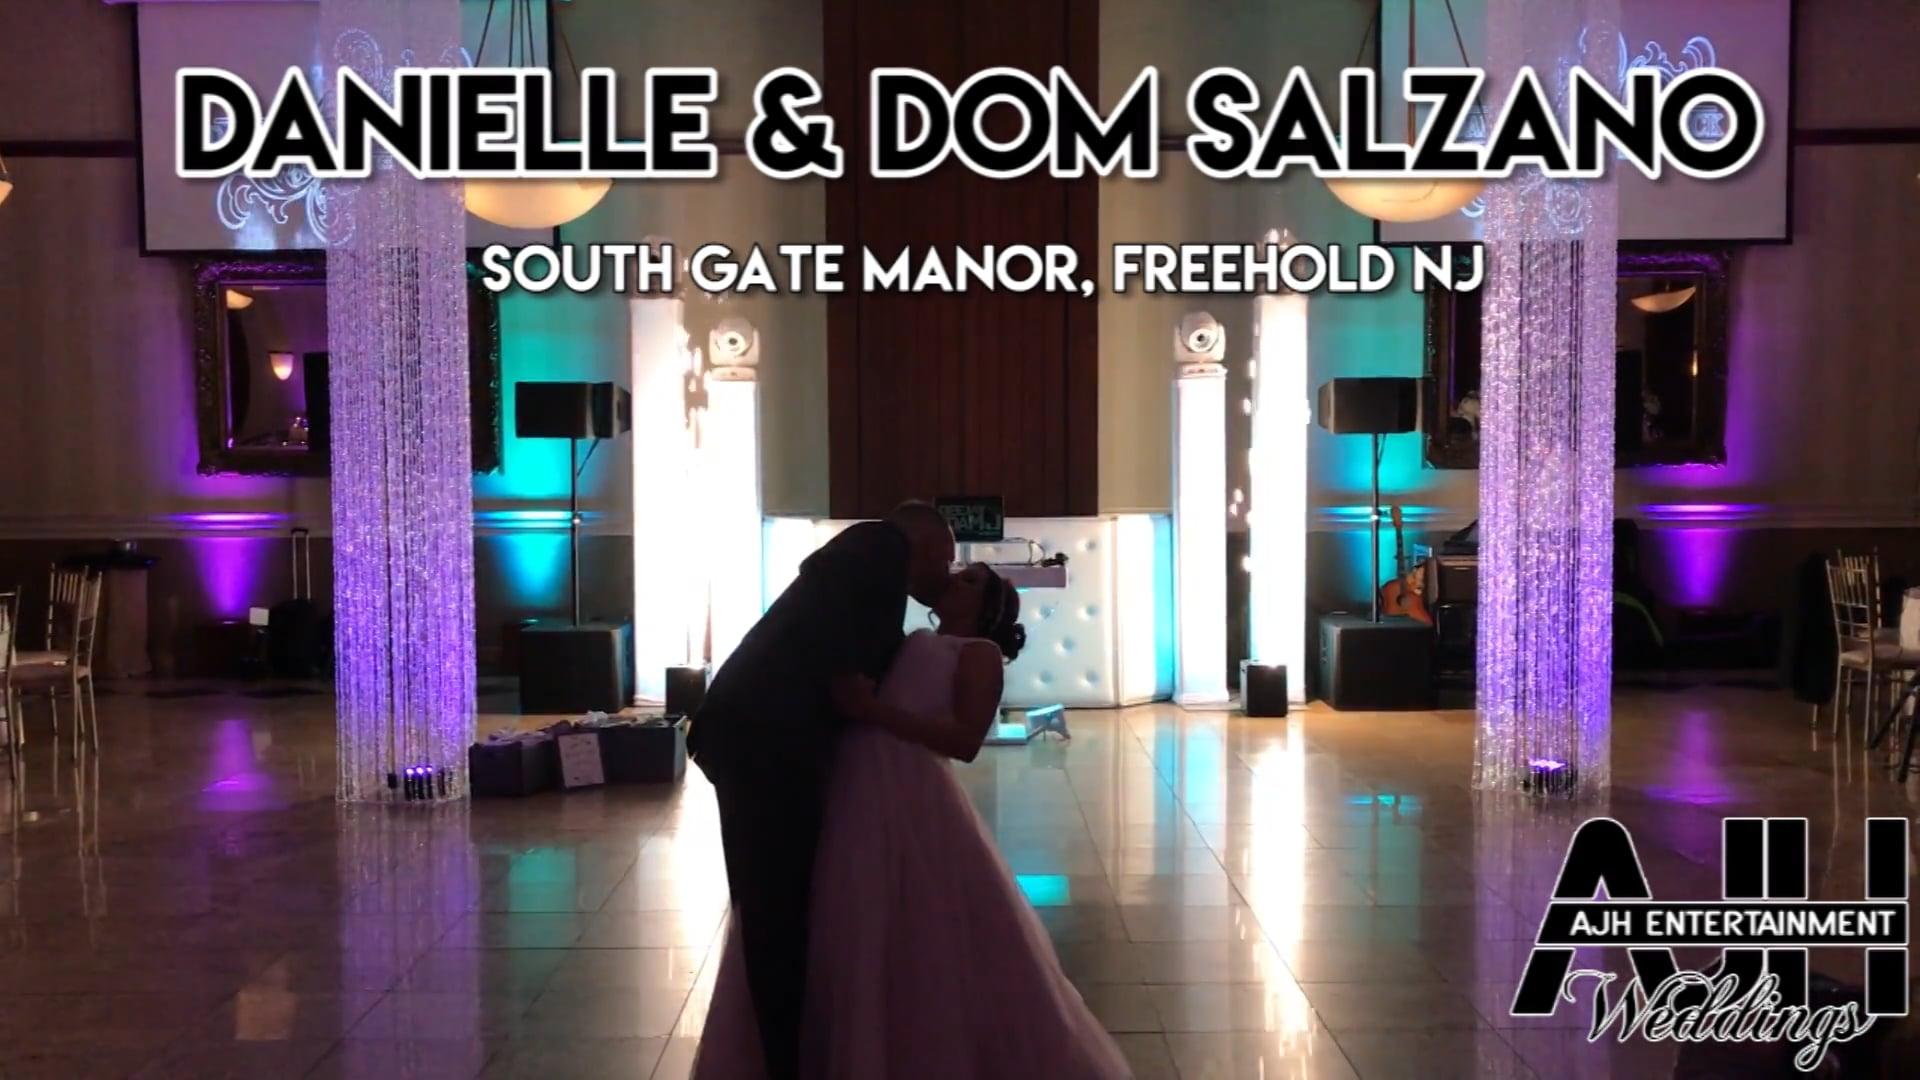 AJH Entertainment: Danielle & Dom's Wedding; South Gate Manor, Freehold, NJ